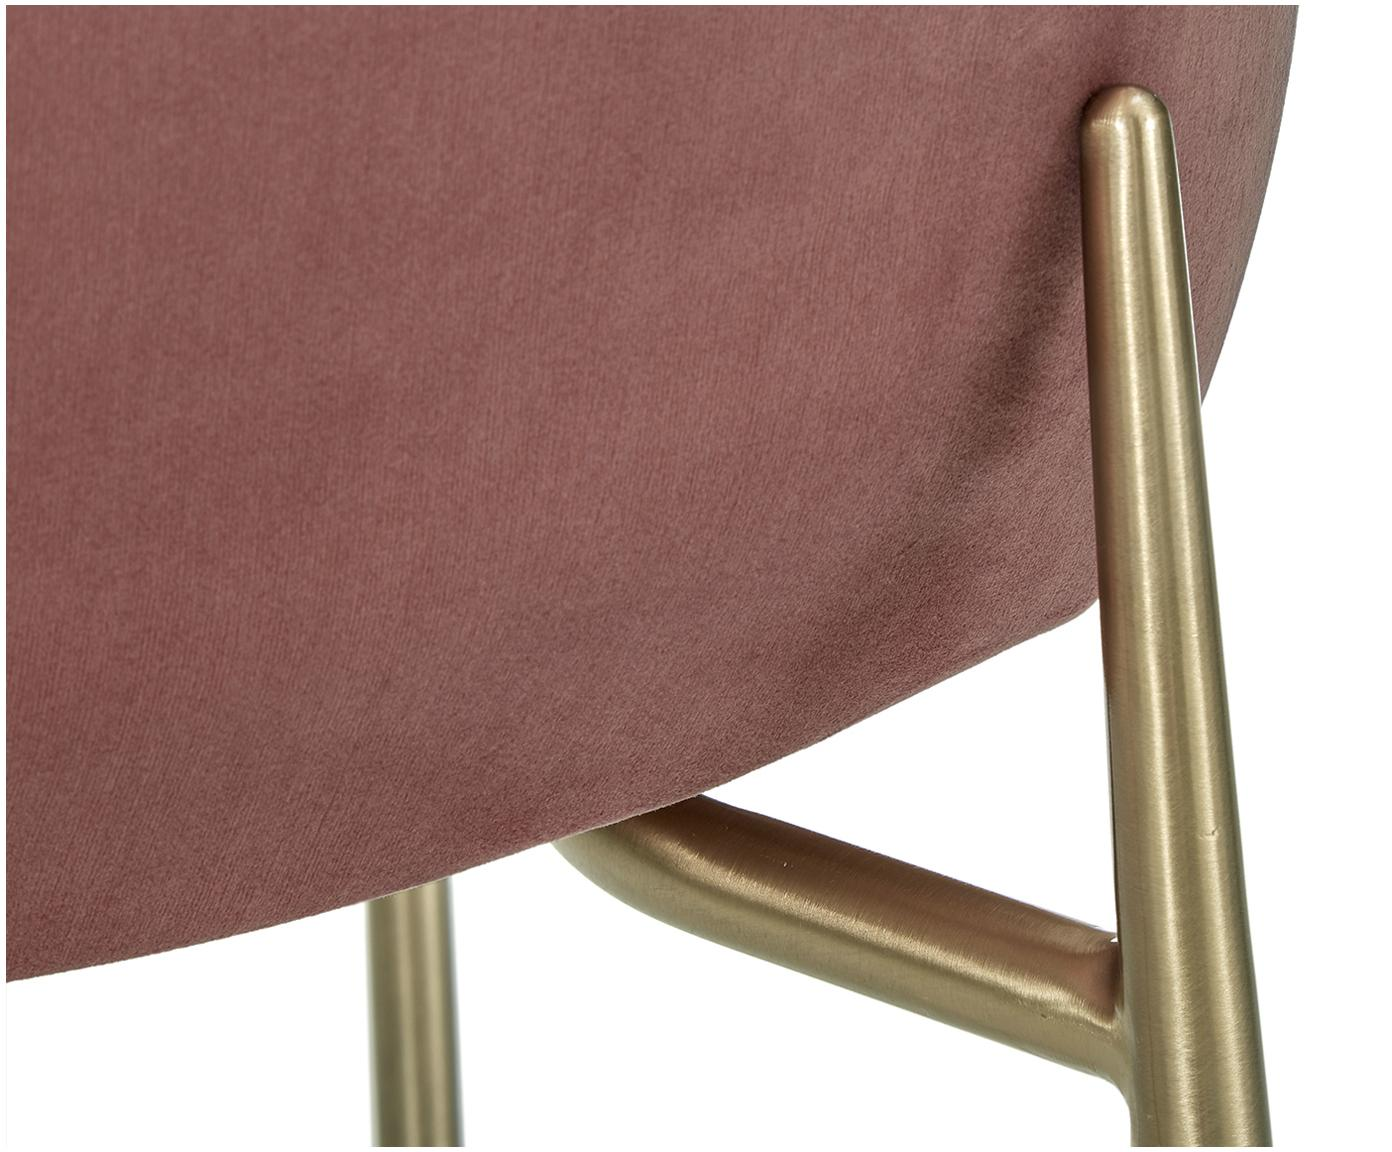 Samt-Polsterstuhl Tess, Bezug: Samt (Polyester) 30.000 S, Beine: Metall, beschichtet, Samt Altrosa, Beine Gold, B 48 x T 64 cm